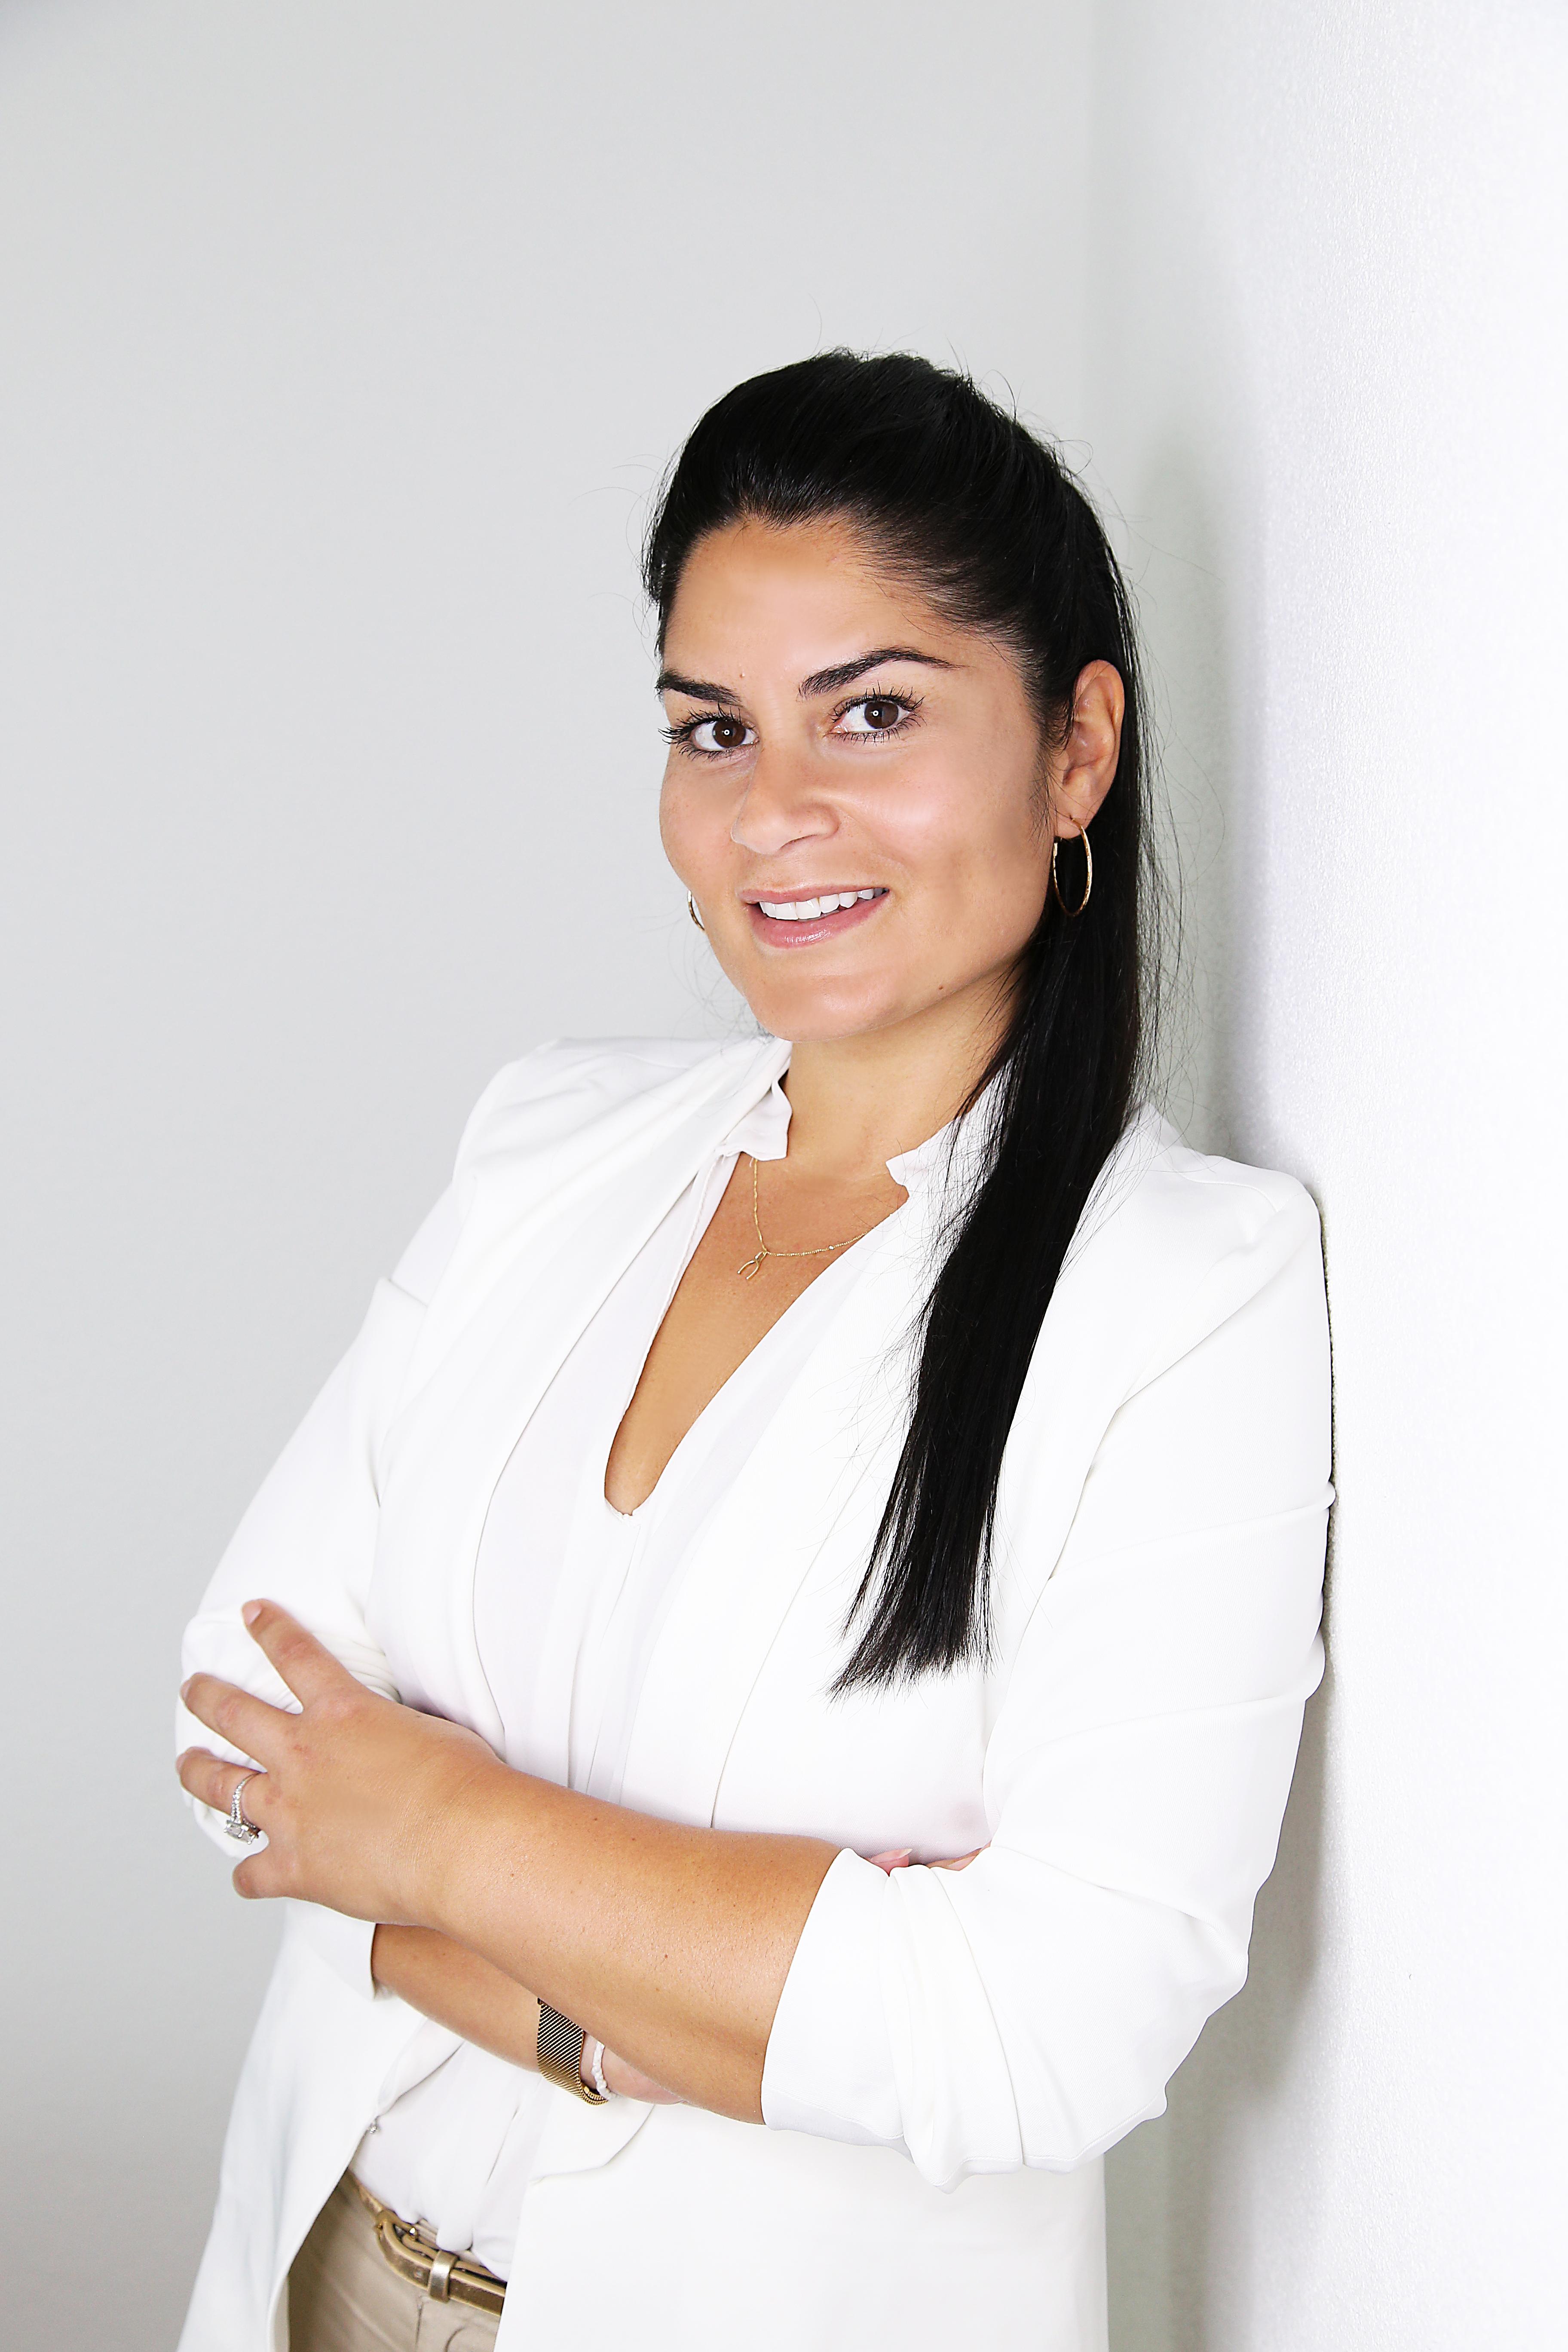 "Gabriella Hanna<br /><a href=""http://www.bellas-kosmetik.de/cpt_team/gabriella-hanna"" style=""font-size: 60%; font-weight: normal;"">→ zur Profilseite</a>"